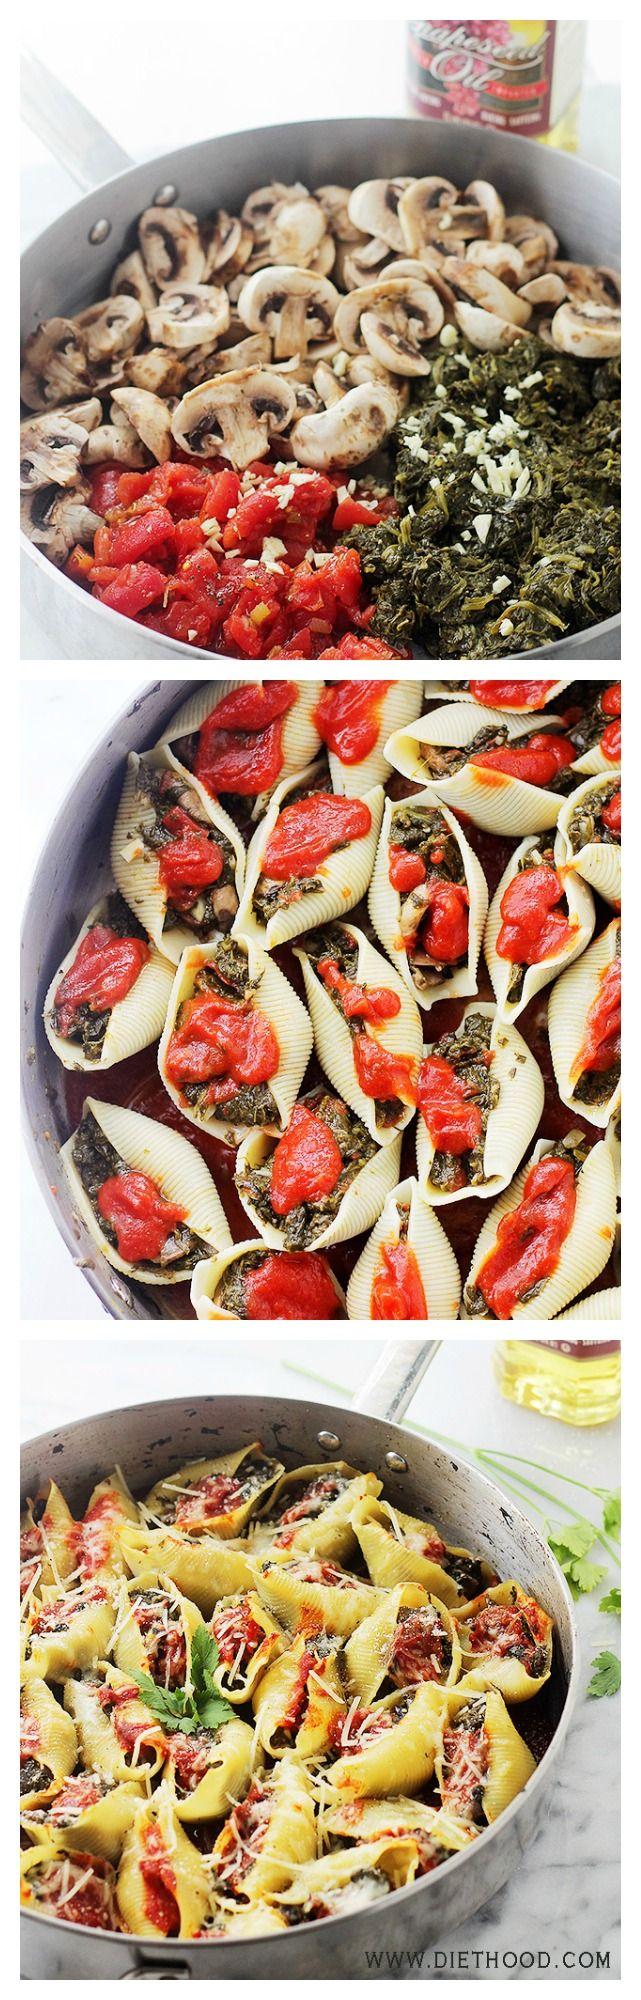 Stuffed Shells Florentine - Jumbo Pasta Shells stuffed with a flavorful spinach, tomato, and mushroom mixture.